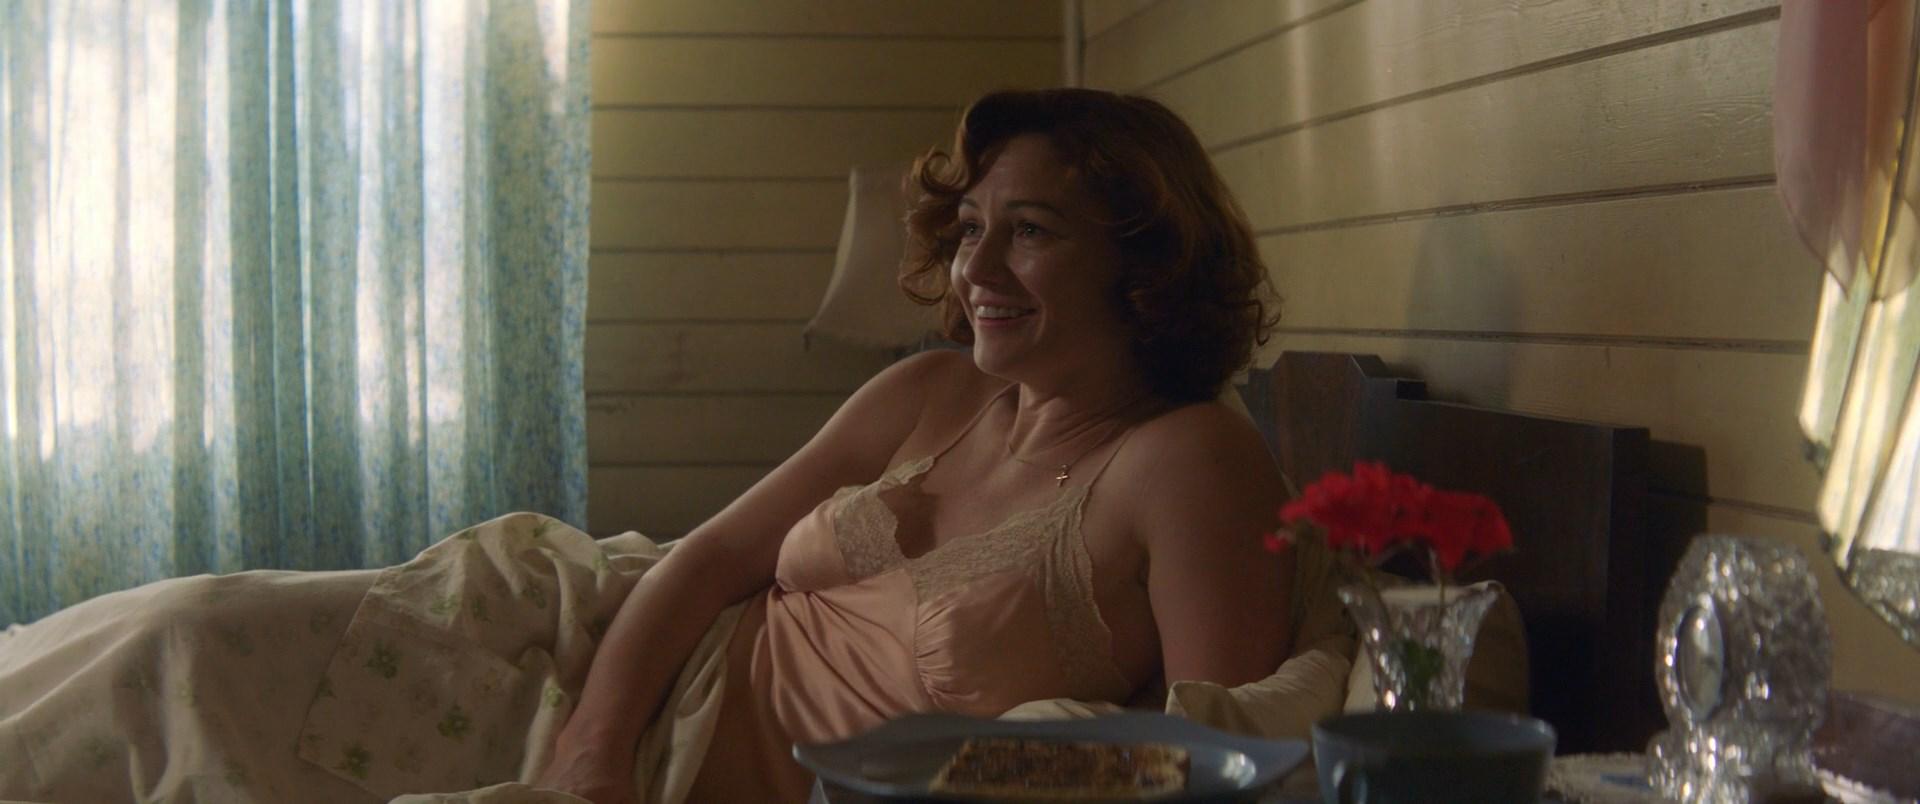 Alison Pill Sex Scene nude video celebs » alison mcgirr nude - ladies in black (2018)